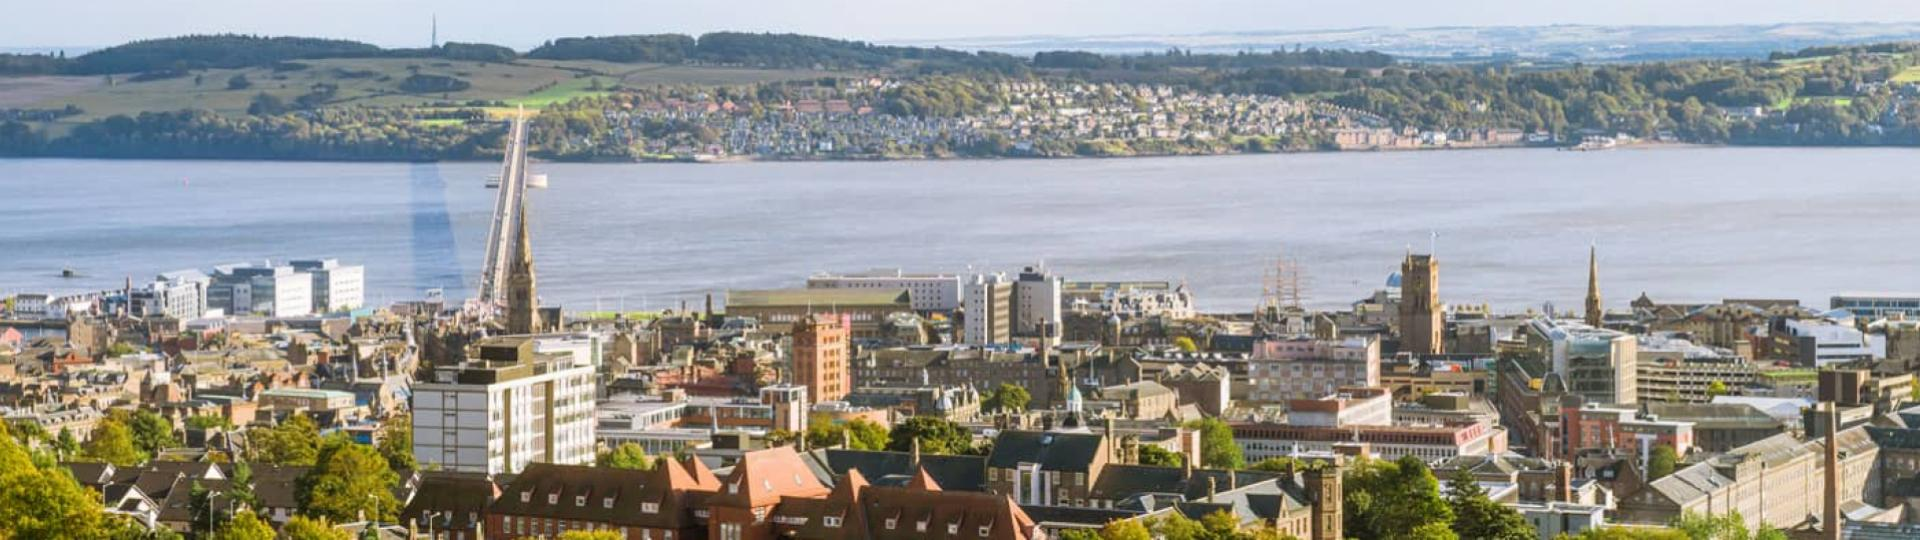 Dundee main city image